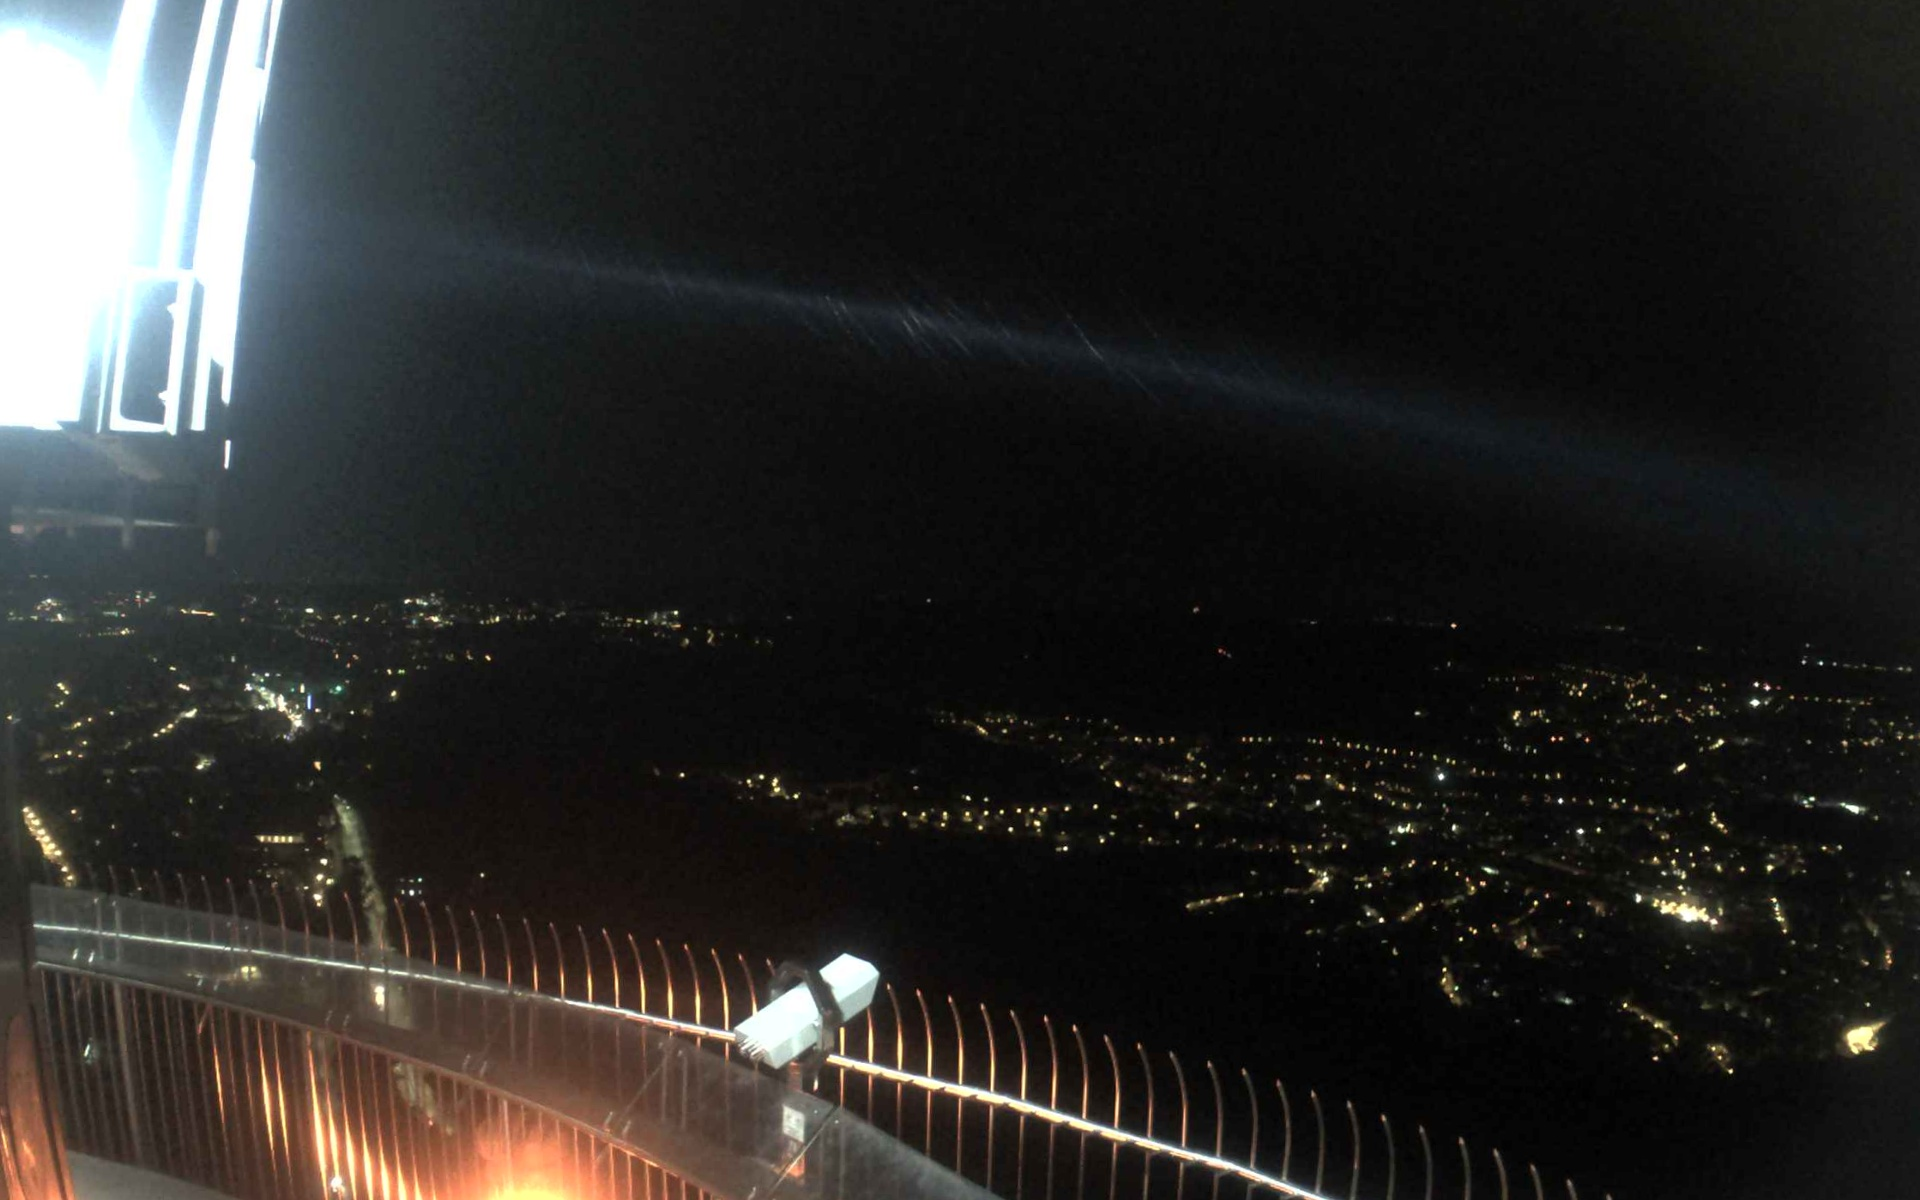 Stuttgarter Fernsehturm 217m (Aussichtsplatform 150m) Blick nach Westen